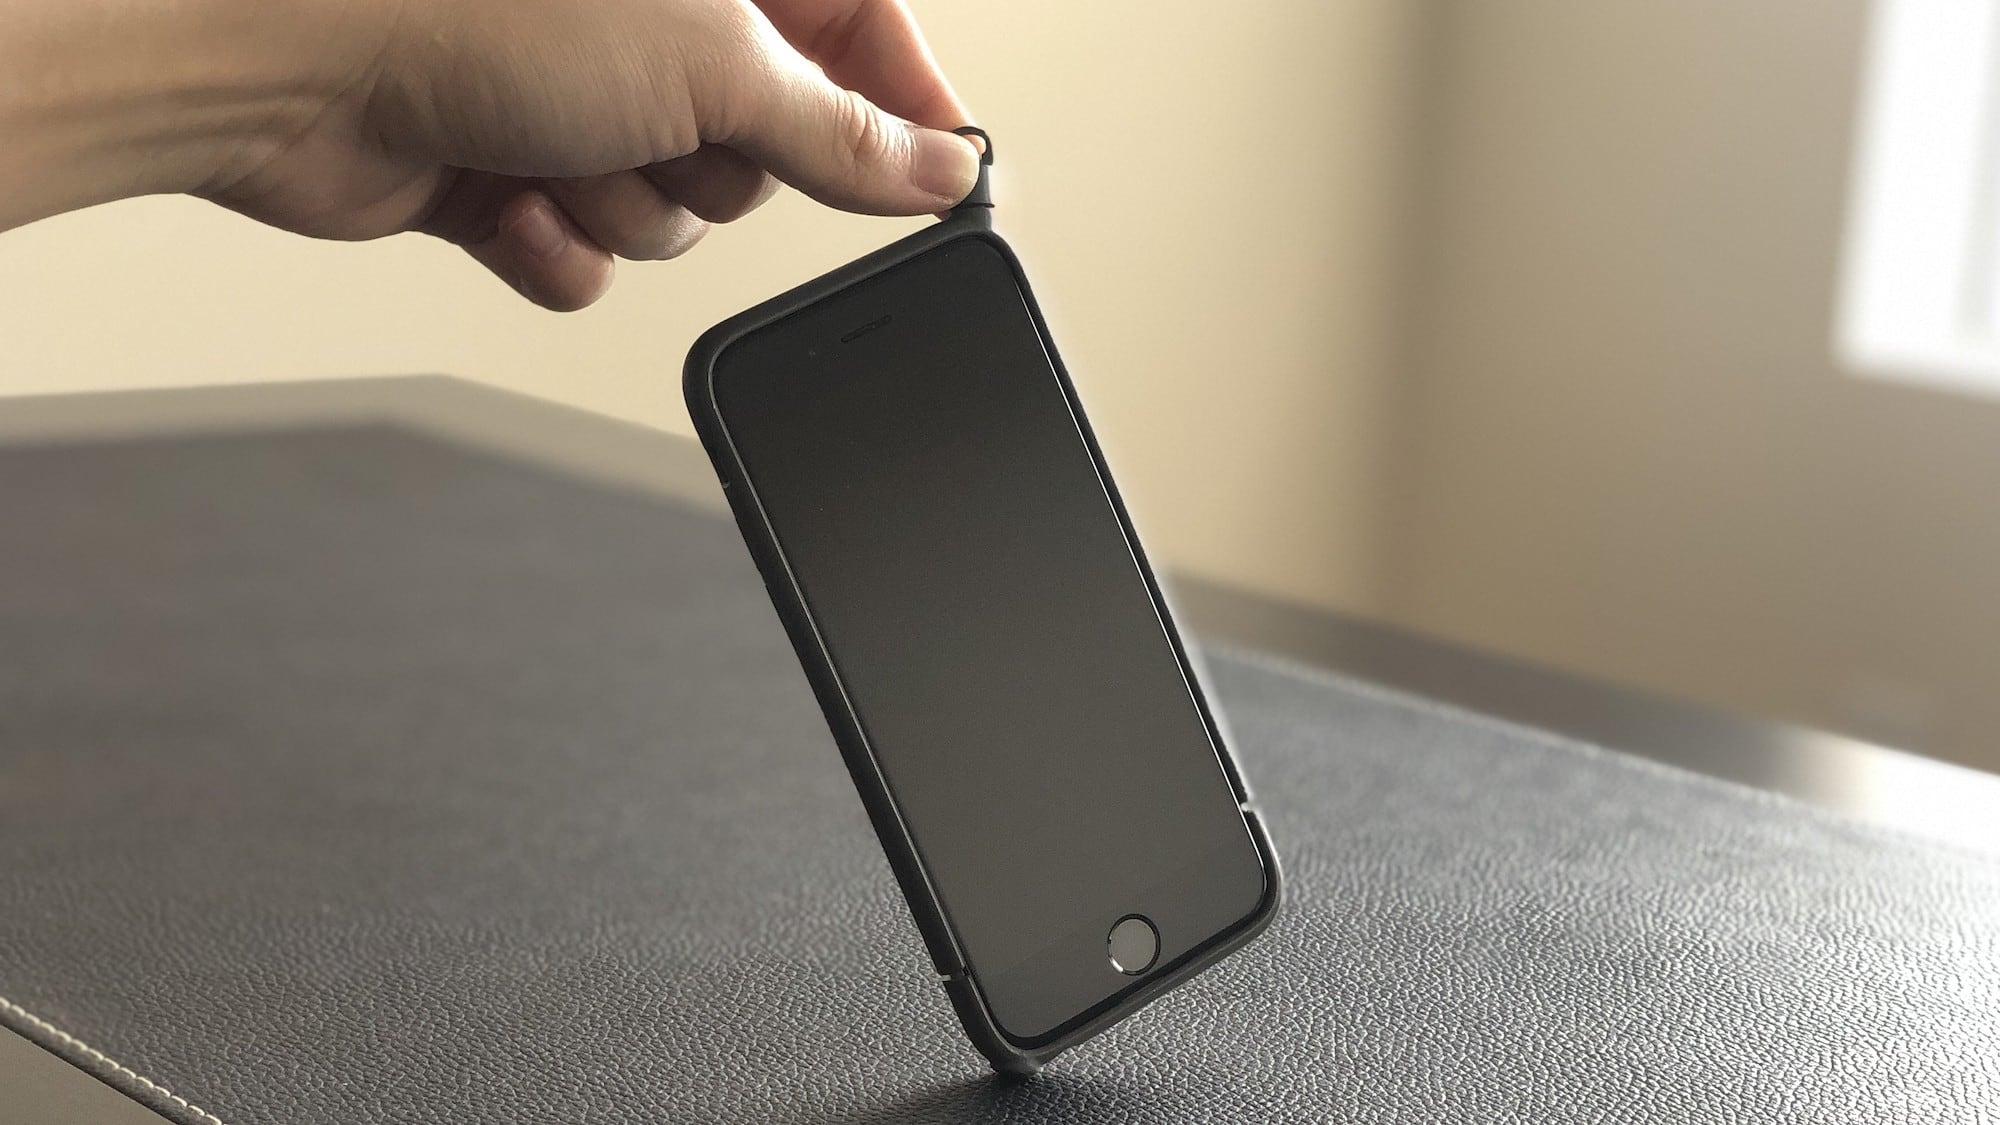 Fidget Case Playful Phone Cover